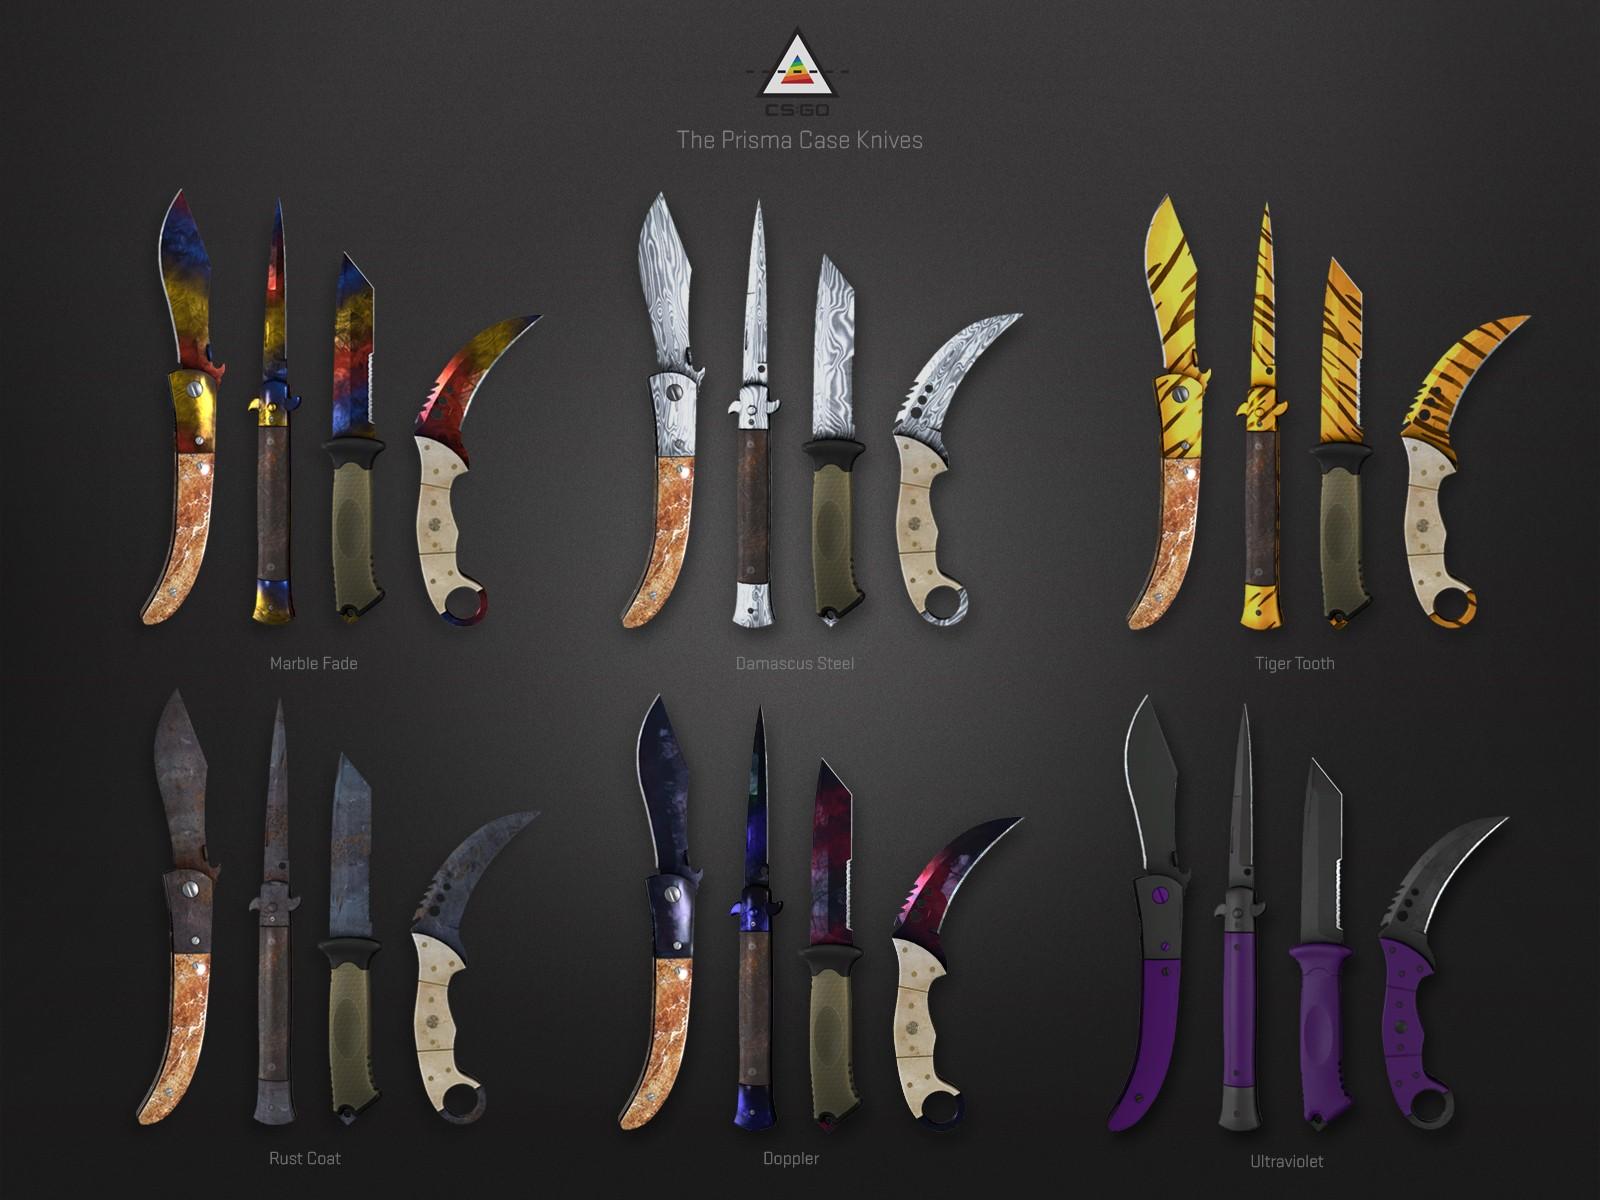 prisma 2 case ножи